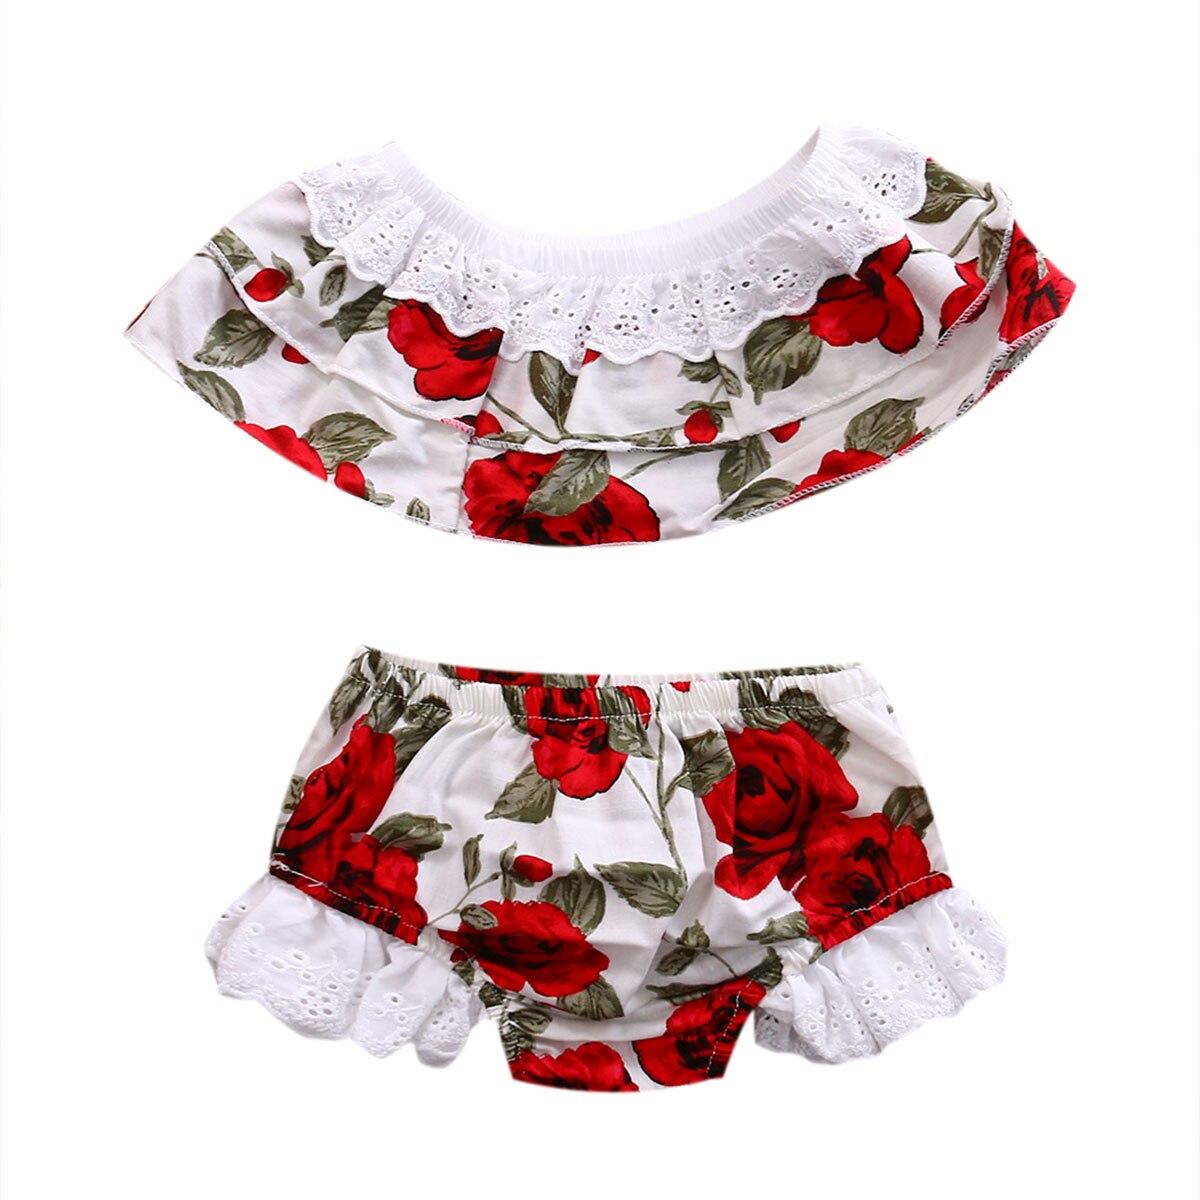 0-6y Sommer Kleinkind Kinder Baby Mädchen Off Schulter Spitze Blume Crop Tops Shorts Hose Pumphose 2 Pcs Outfits Mädchen Kleidung Set